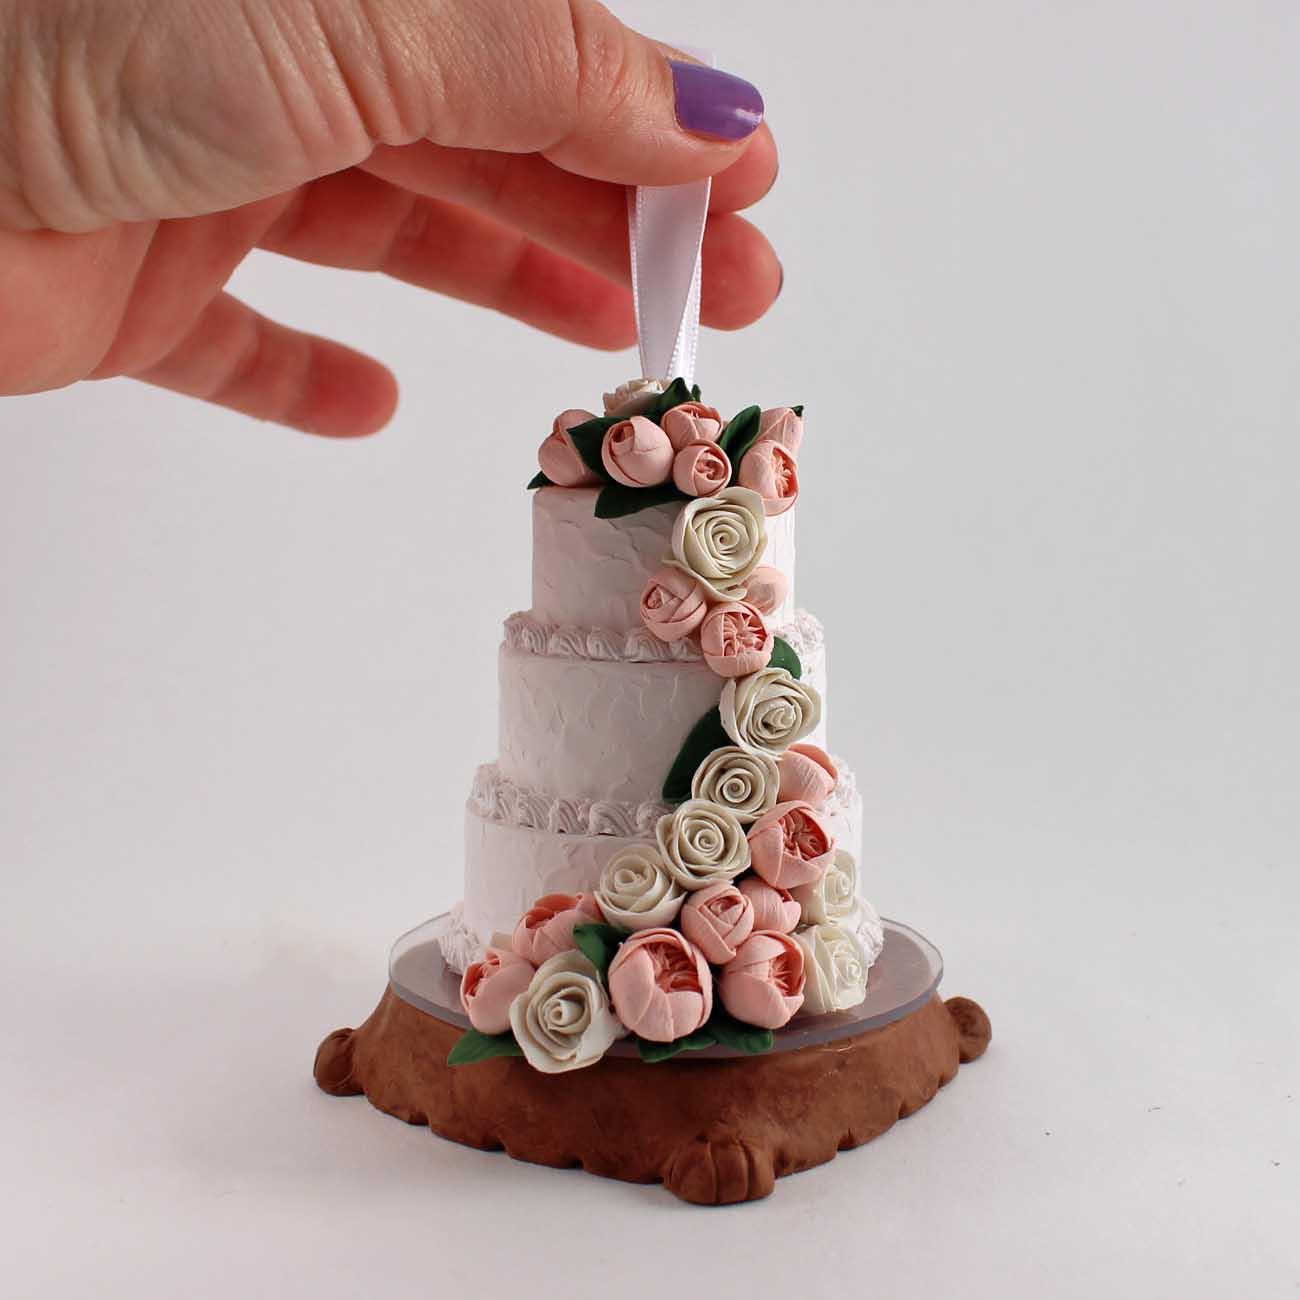 mini wedding cake replica of cake on wood base.jpg